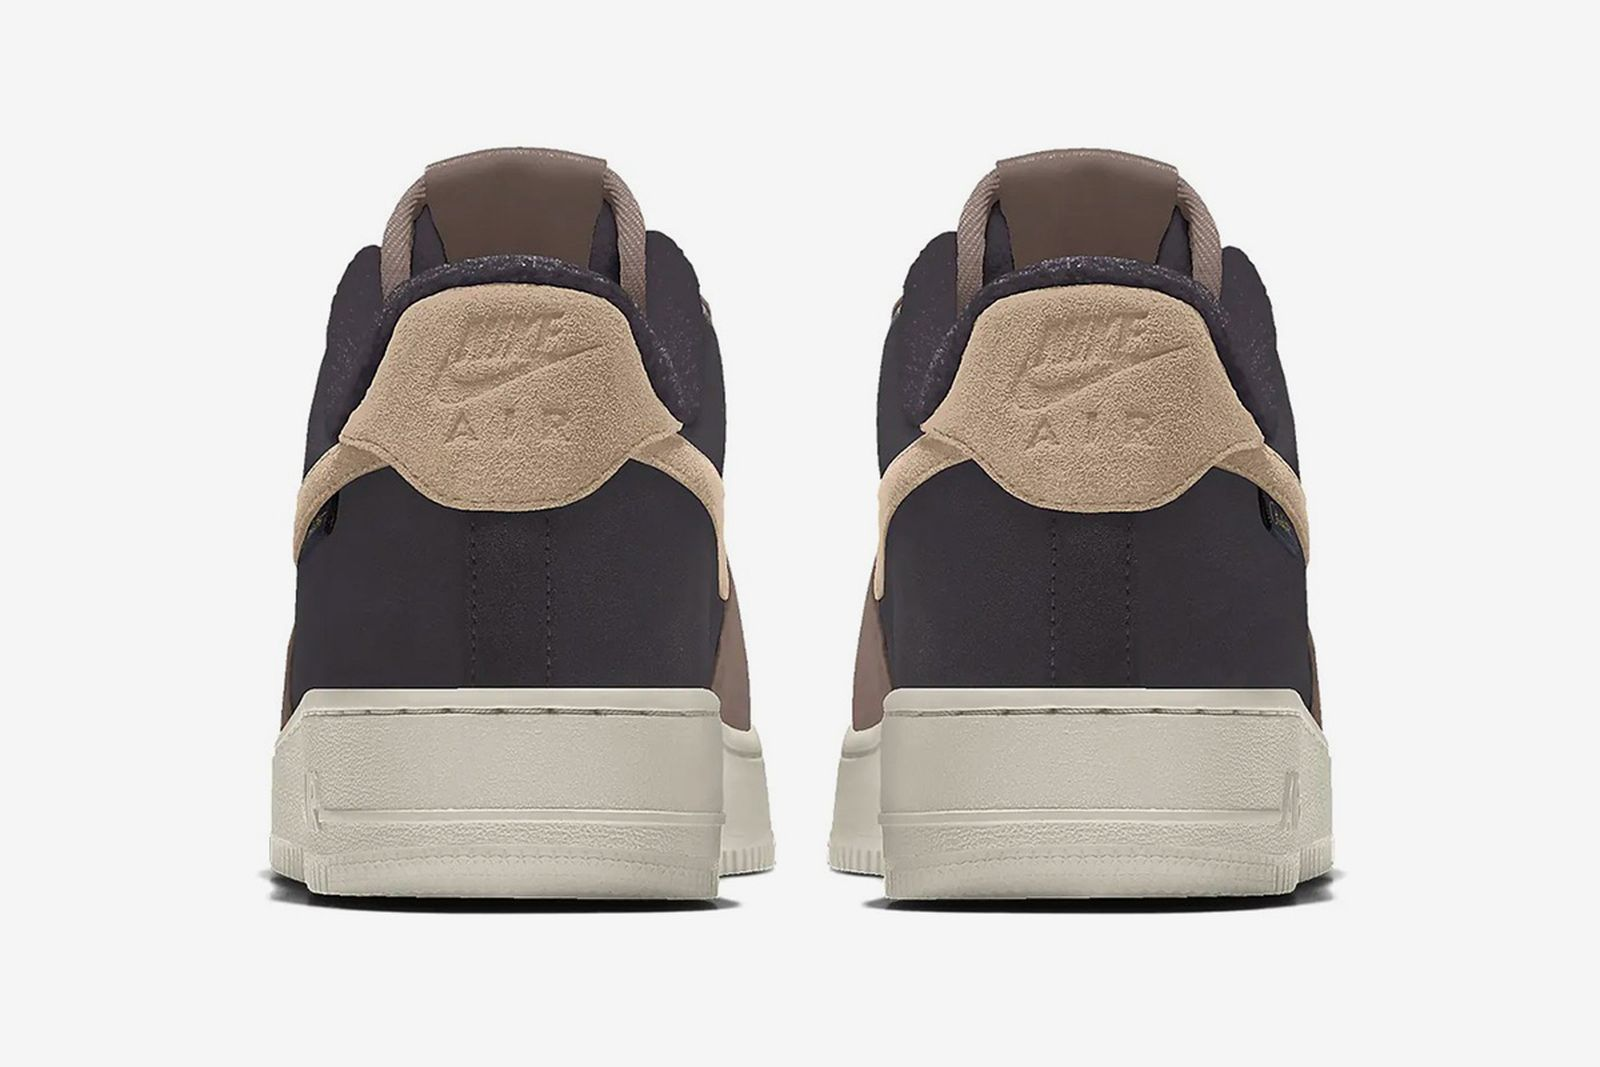 Pendleton x Nike Air Force 1